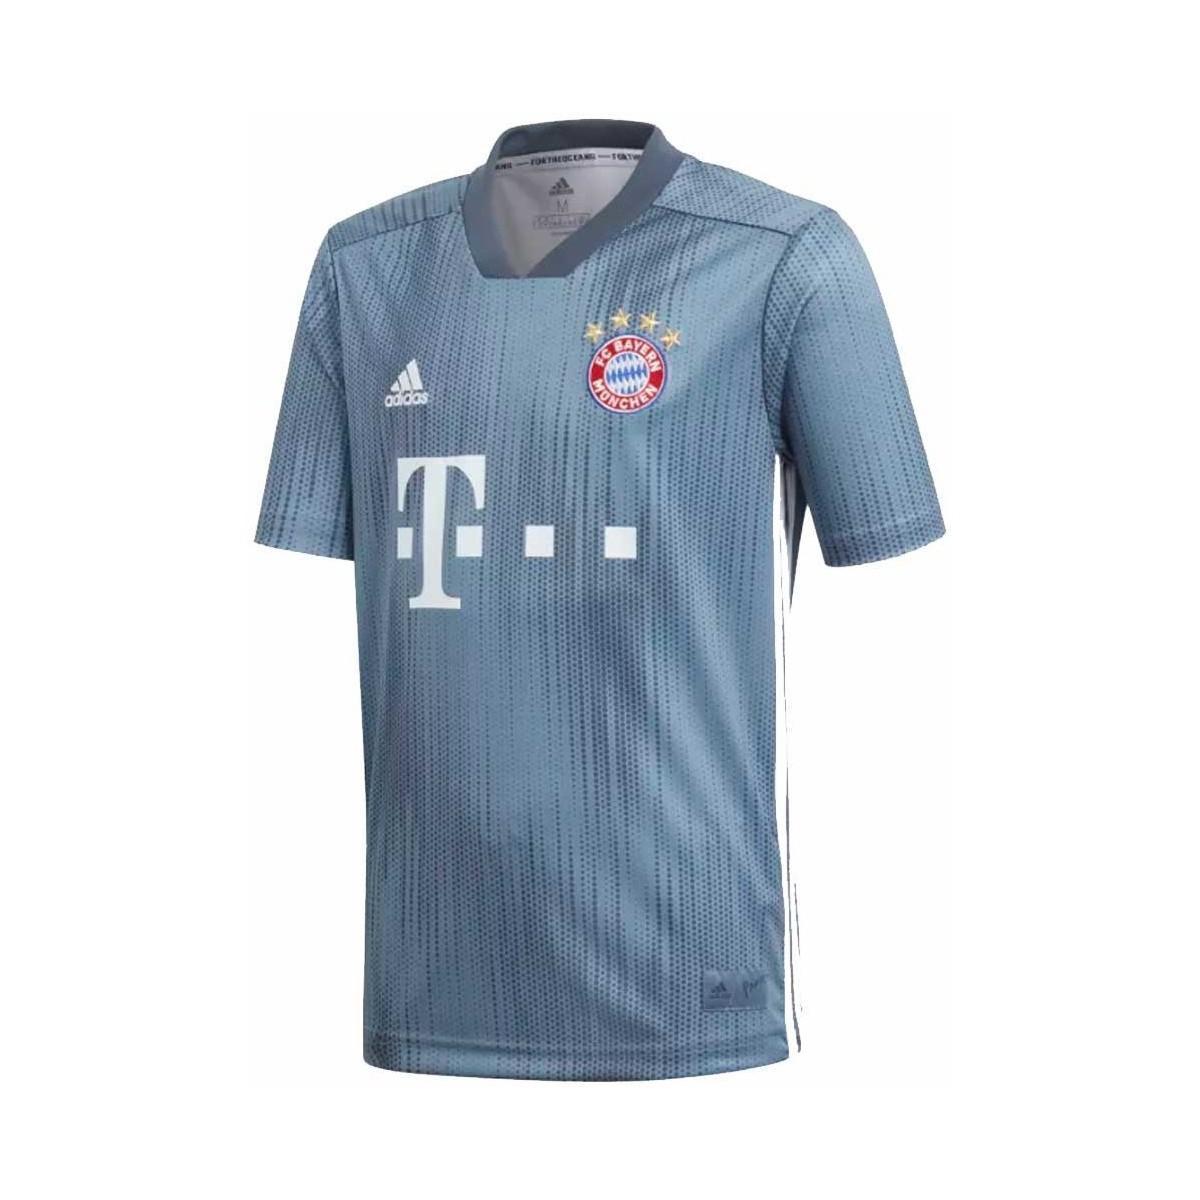 separation shoes 80c5b 1ddc3 Nike 2018-19 Bayern Munich Third Shirt (neuer 1) - Kids ...